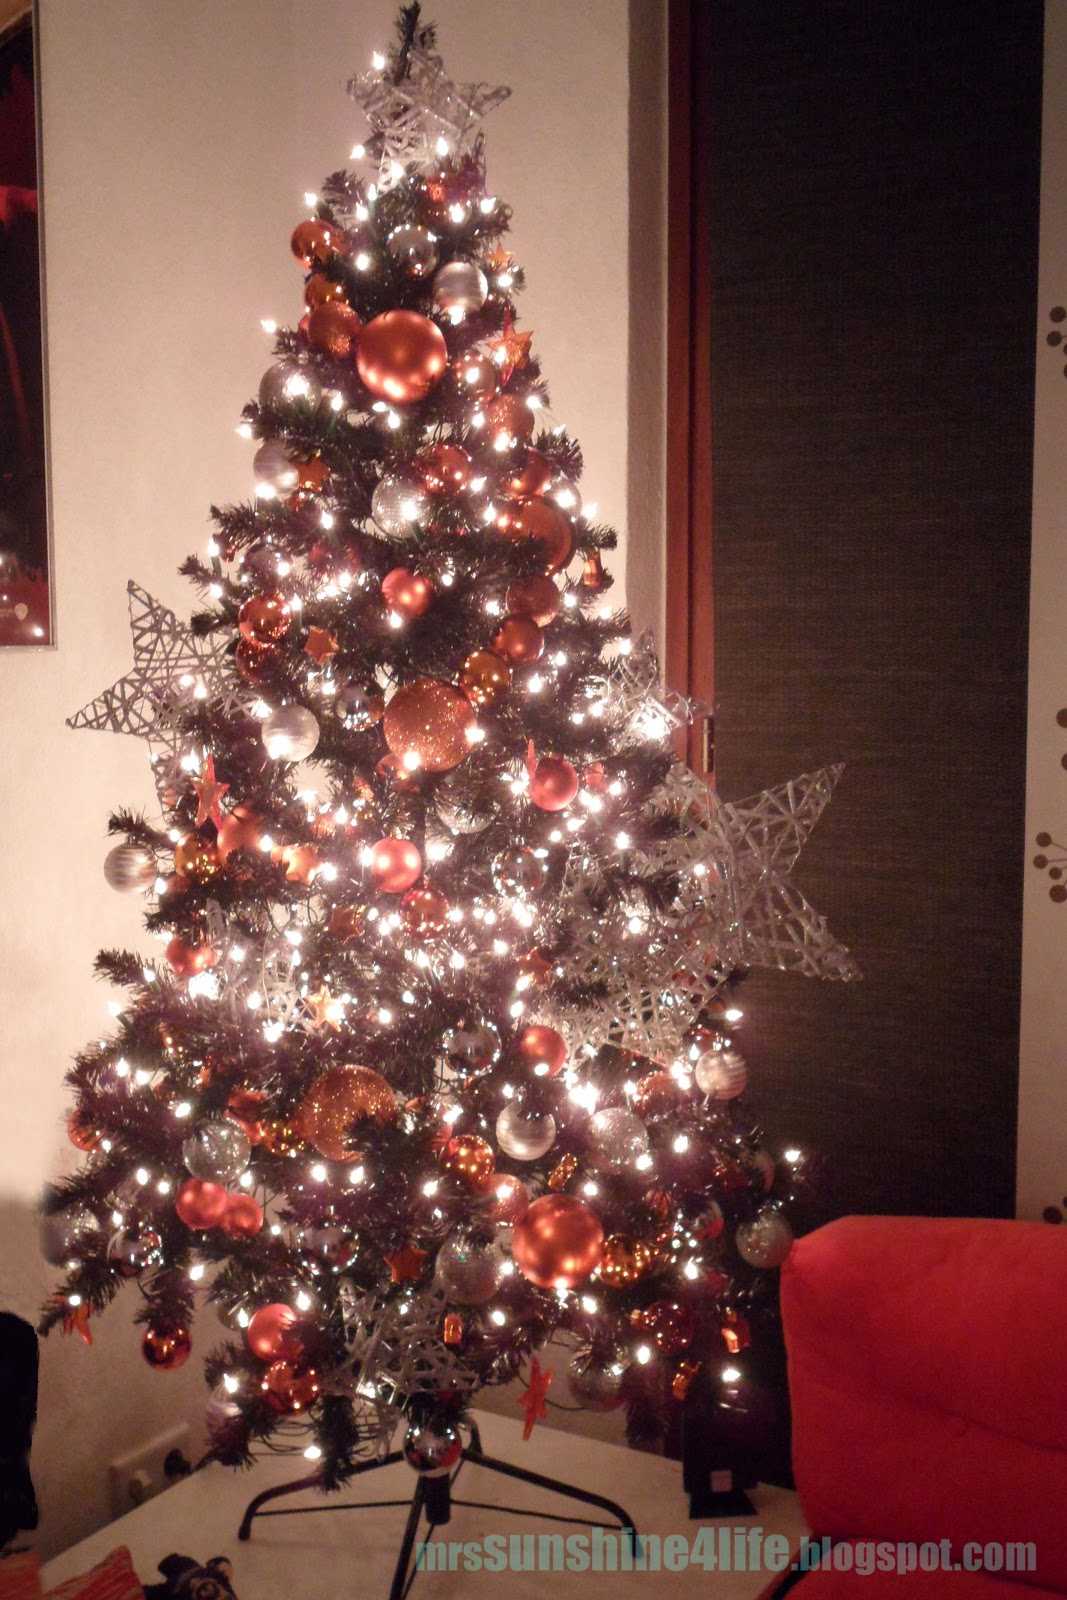 Sunshine4life november 2011 for Weihnachtsbaum rot silber